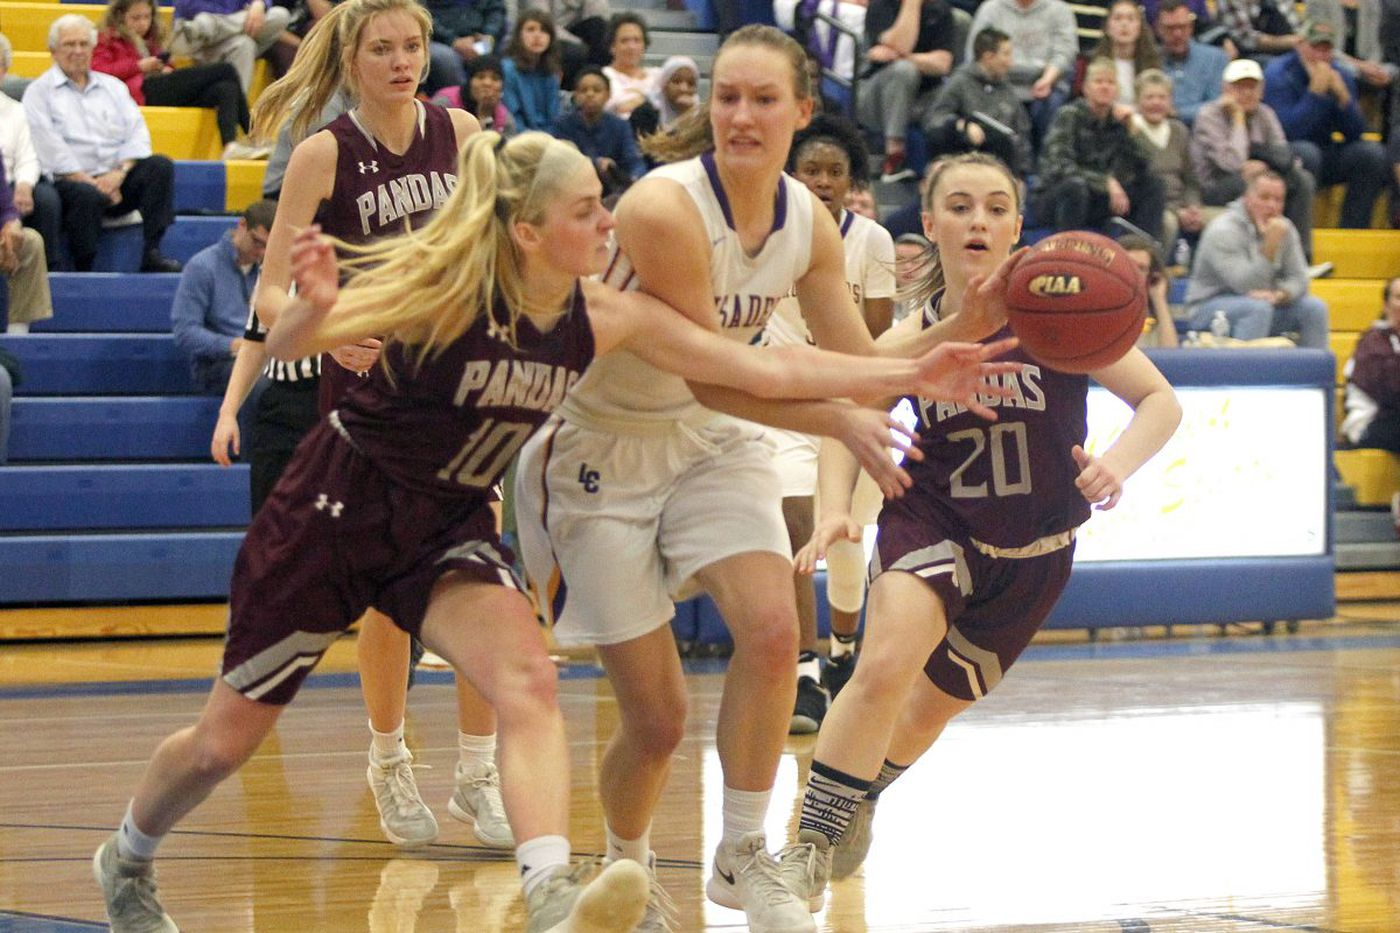 Bonner-Prendergast girls fall to unbeaten Lancaster Catholic in PIAA 4 A state semifinal